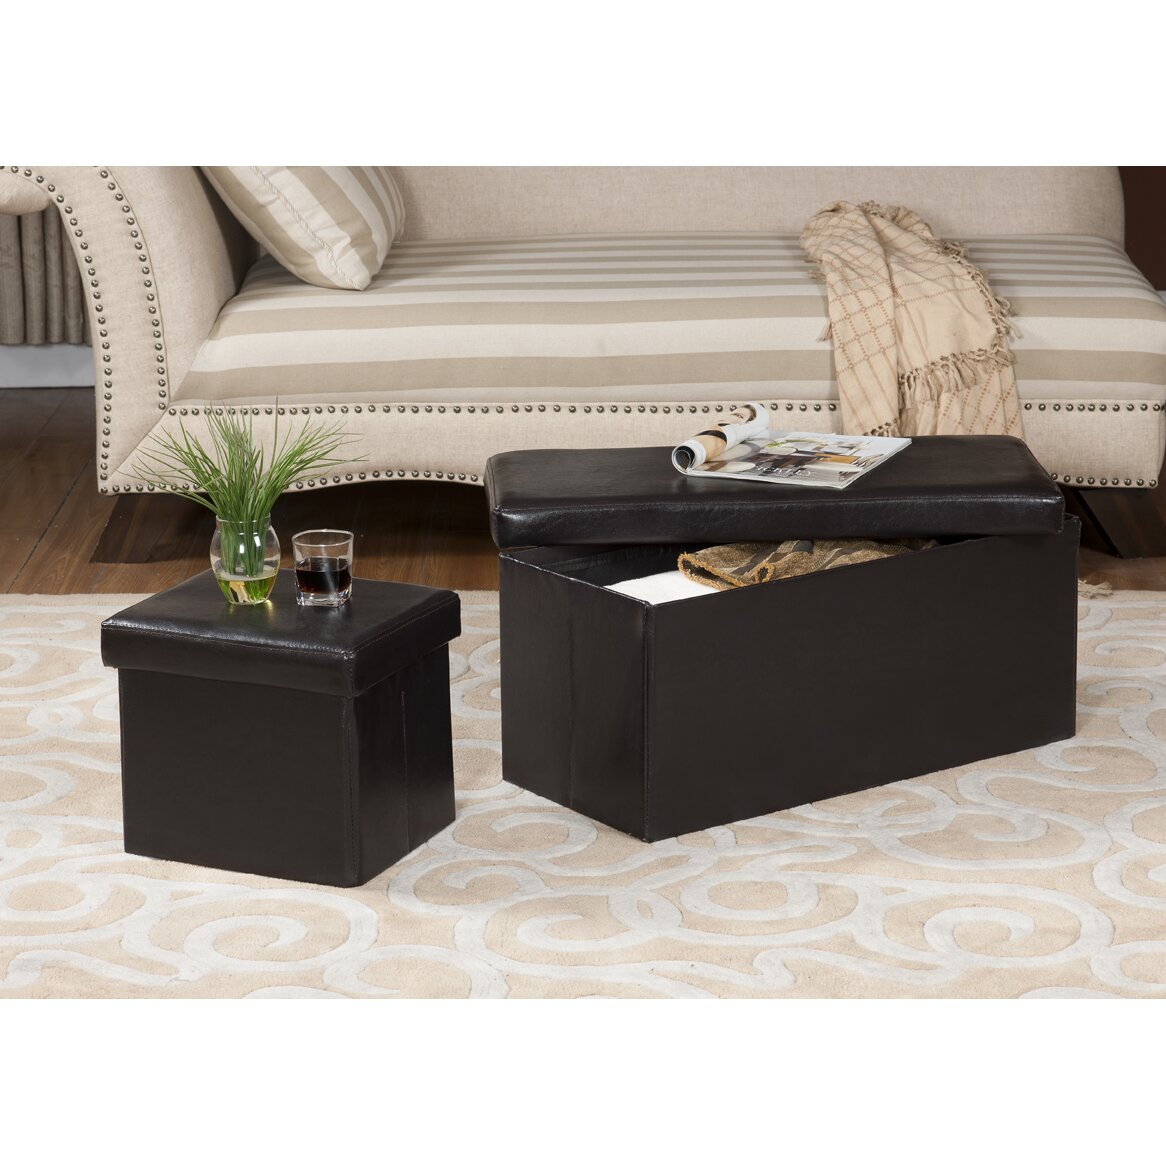 Upholstered Storage Bench Ottoman - InRoom Designs Upholstered Storage Bench Ottoman & Reviews Wayfair